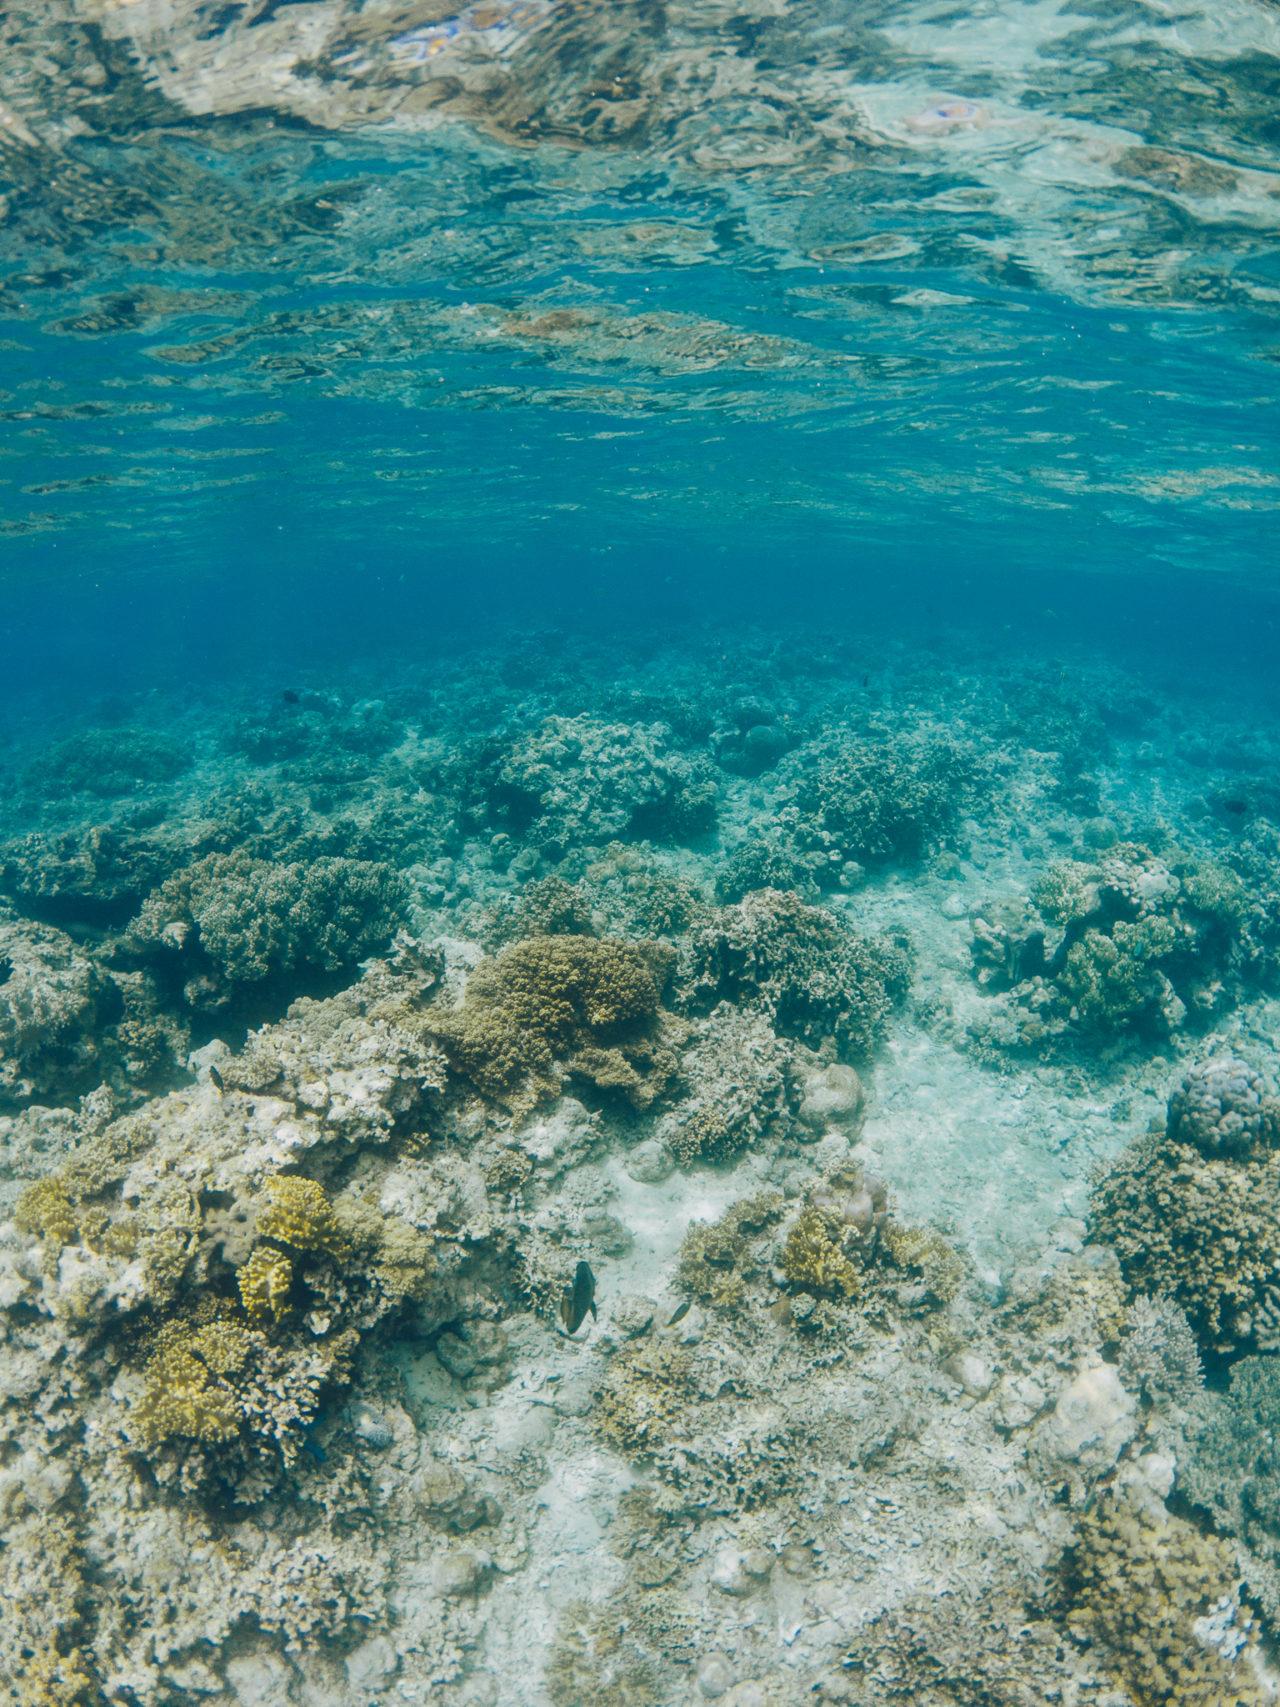 http://www.trendymood.com/wp-content/uploads/2018/04/Pur-Projet-Avène-Eau-Thermale-Bali-Coraux-Snorkeling-1280x1707.jpg